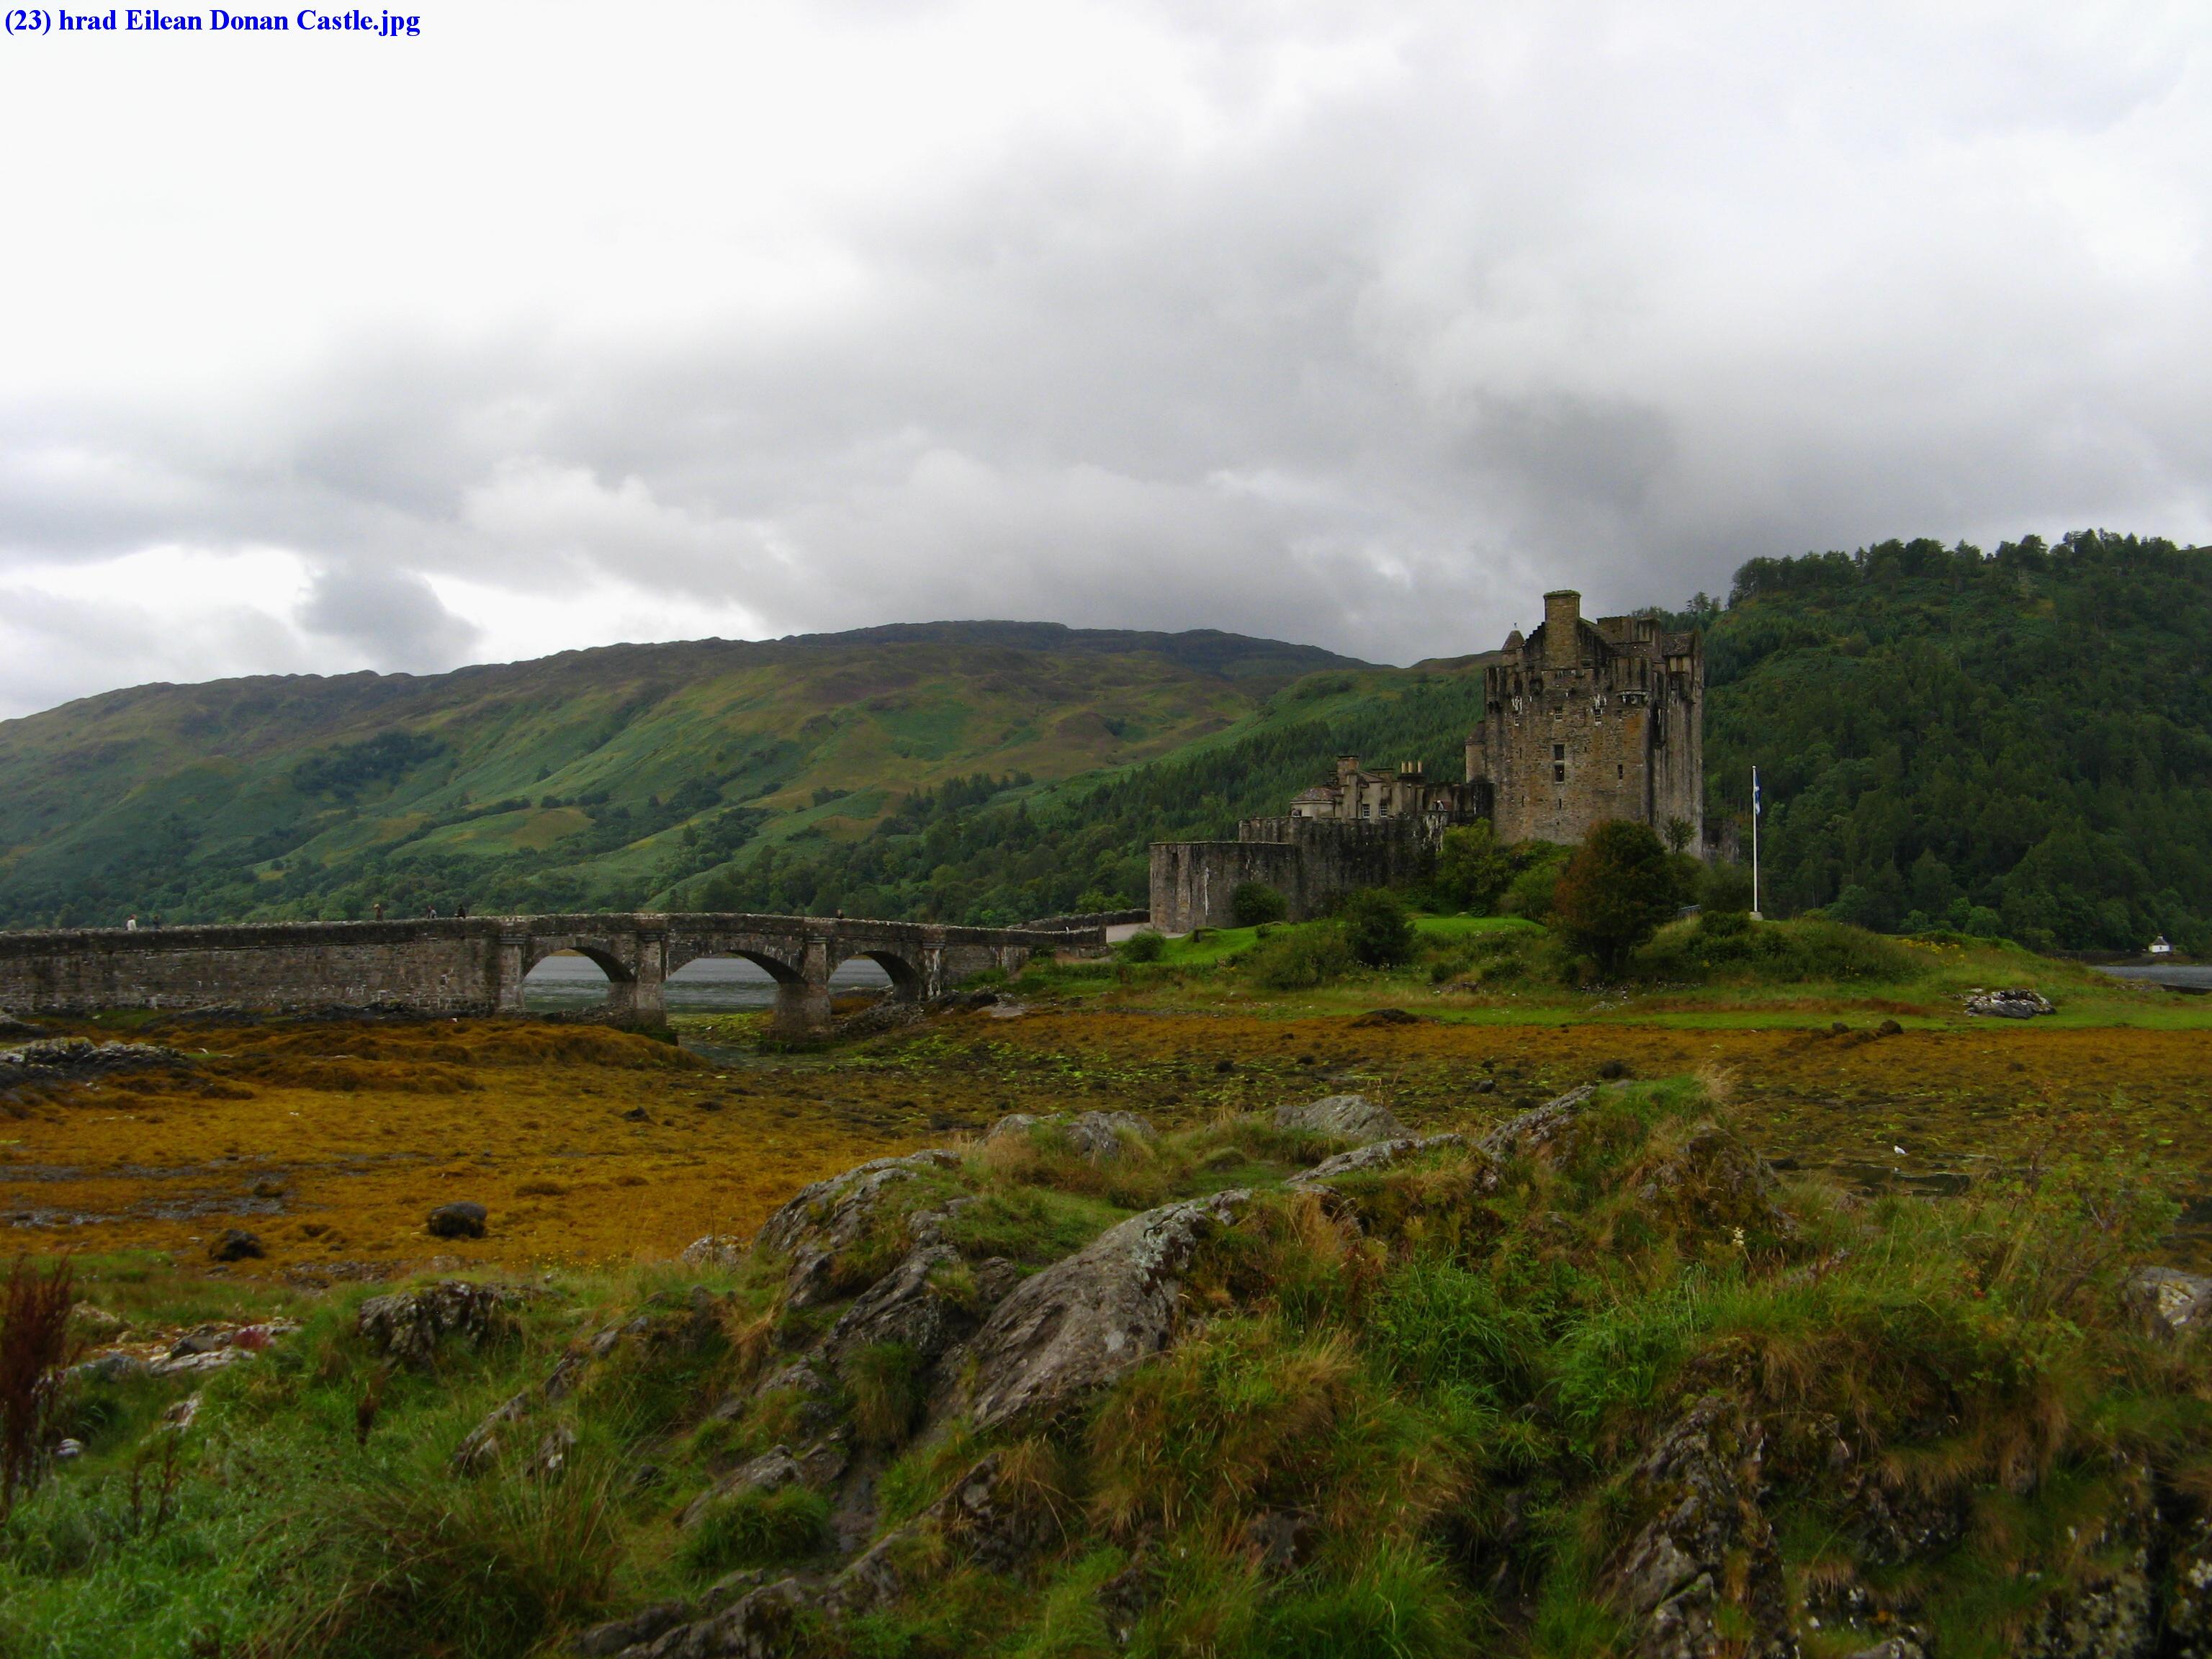 (23) Eilean Donan Castle